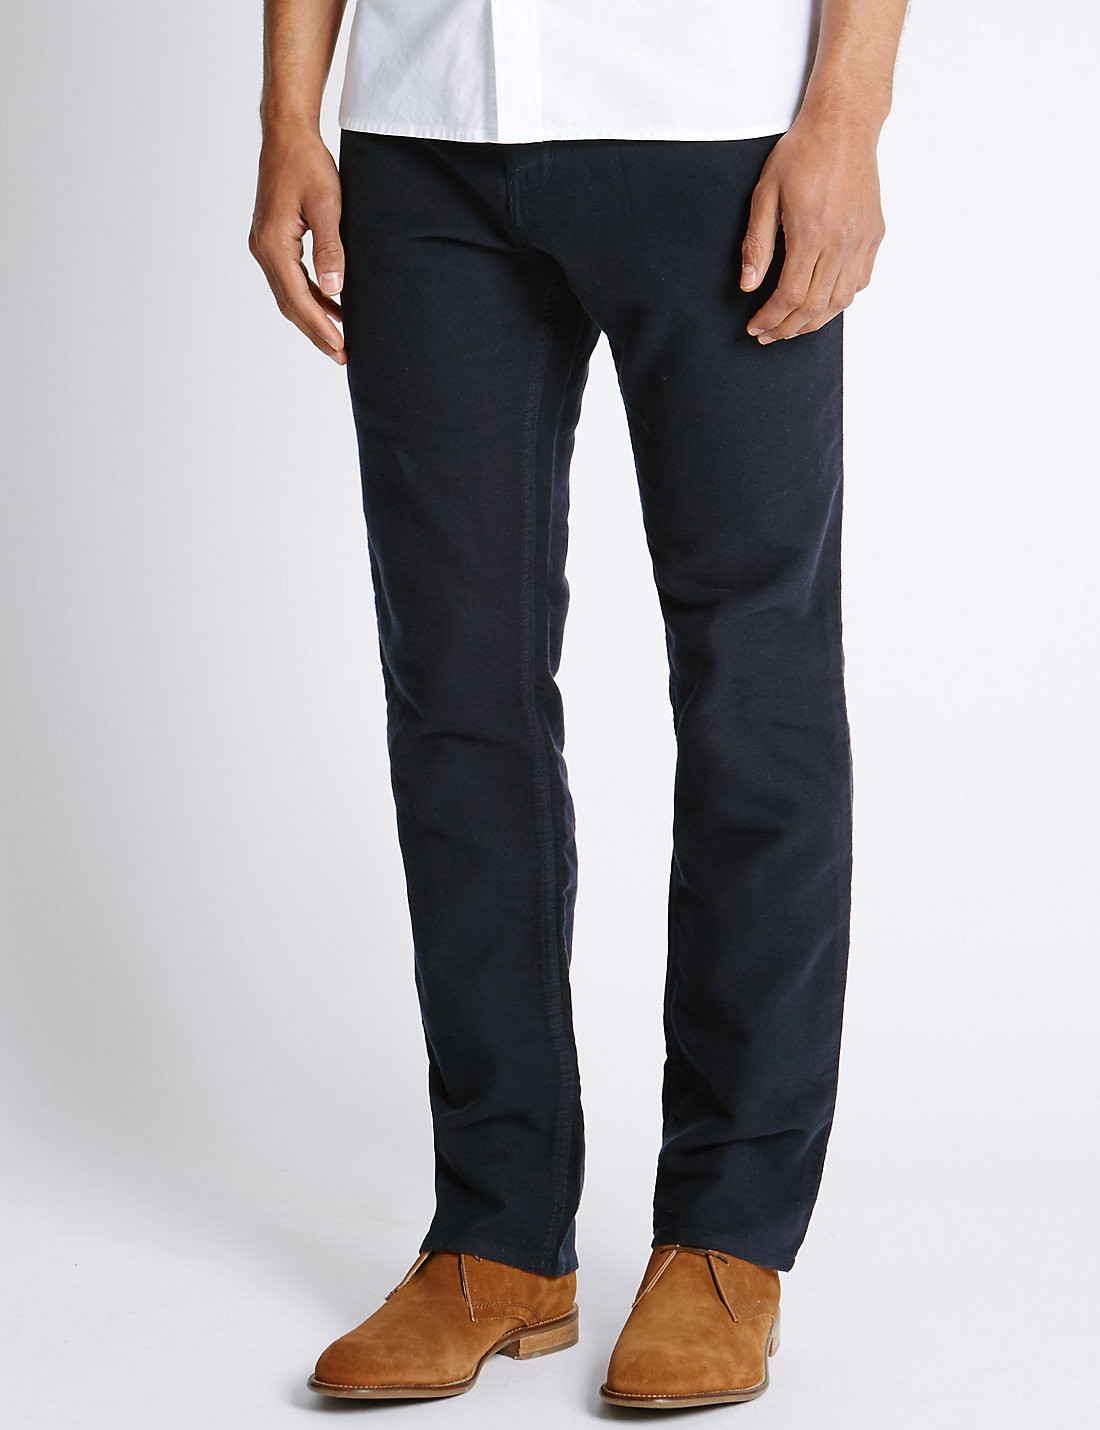 Saf Pamuklu Regular Fit Moleskin Pantolon